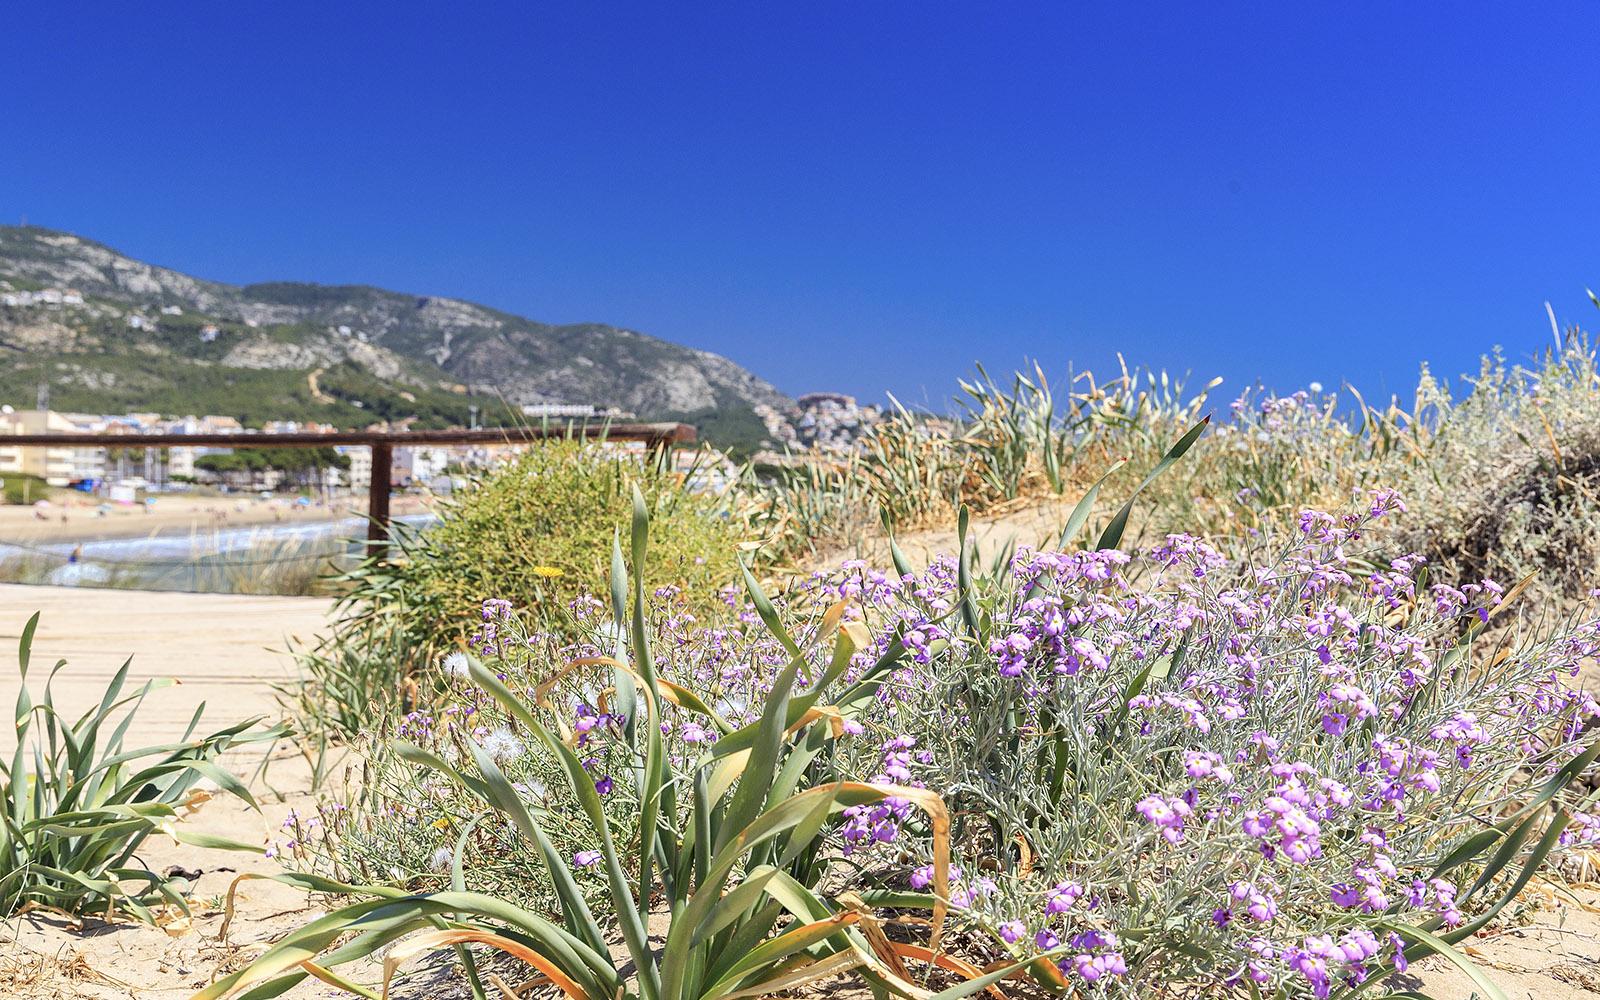 Turismo-Alcossebre-Playa-Carregador-Alcossebre-Zona-Dunar